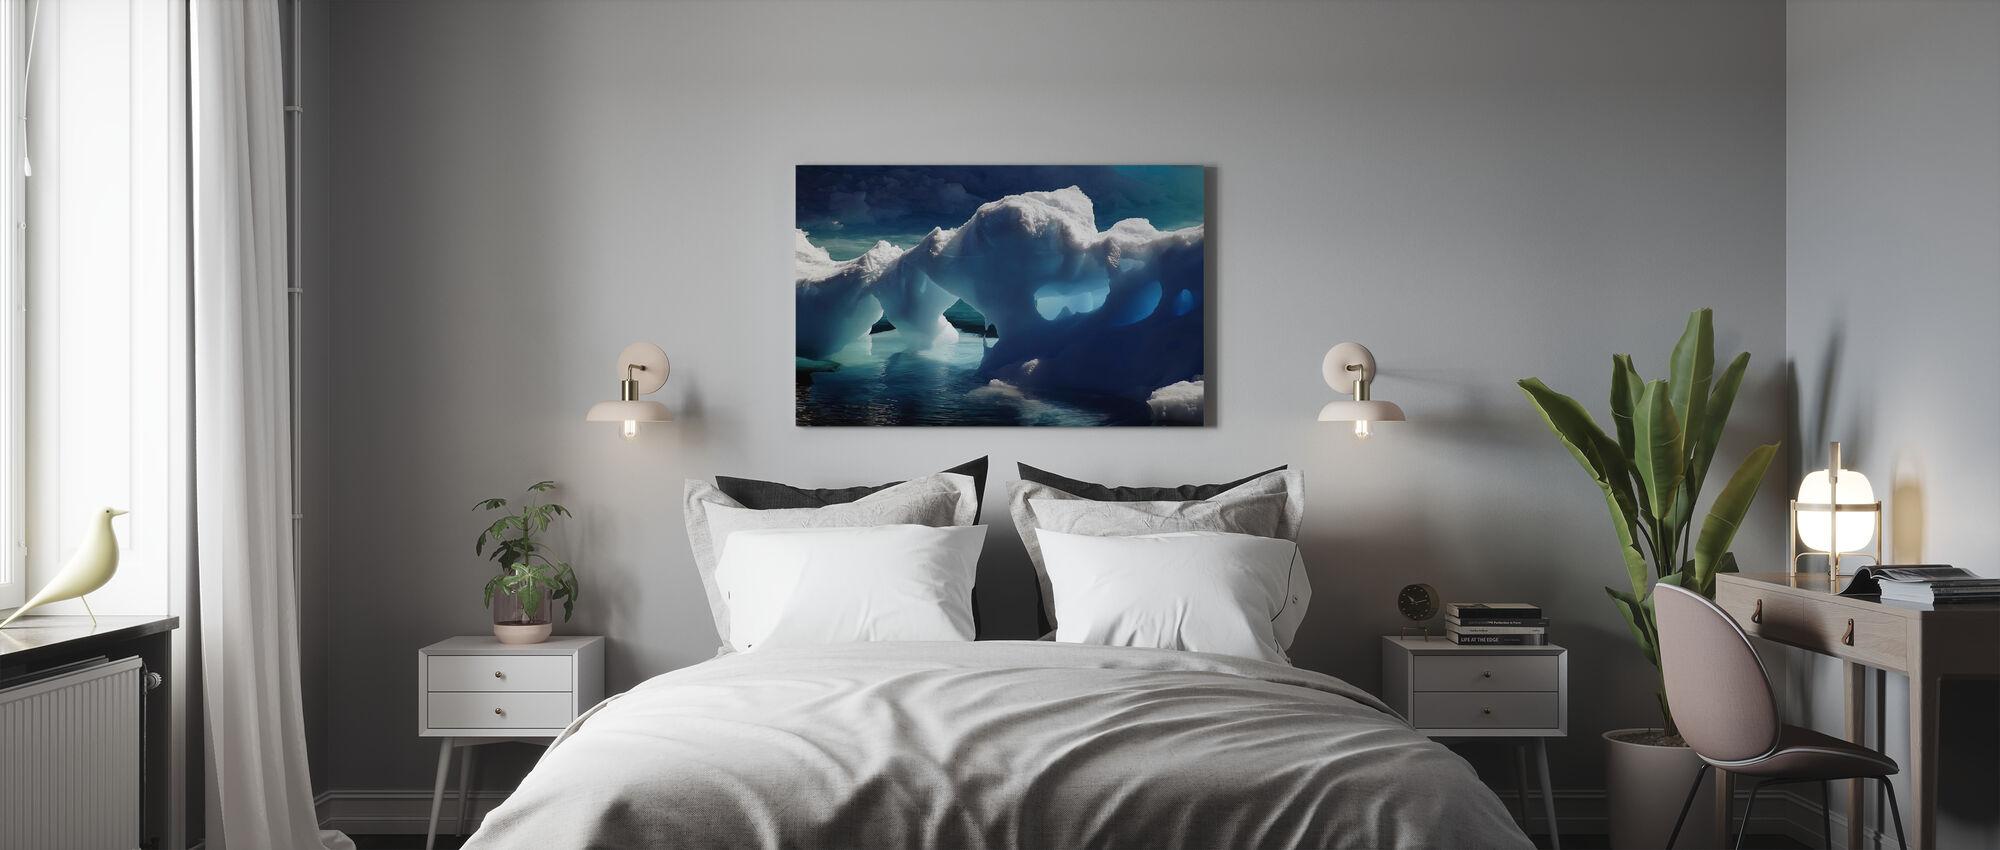 Antarktis isgrotter - Lerretsbilde - Soverom